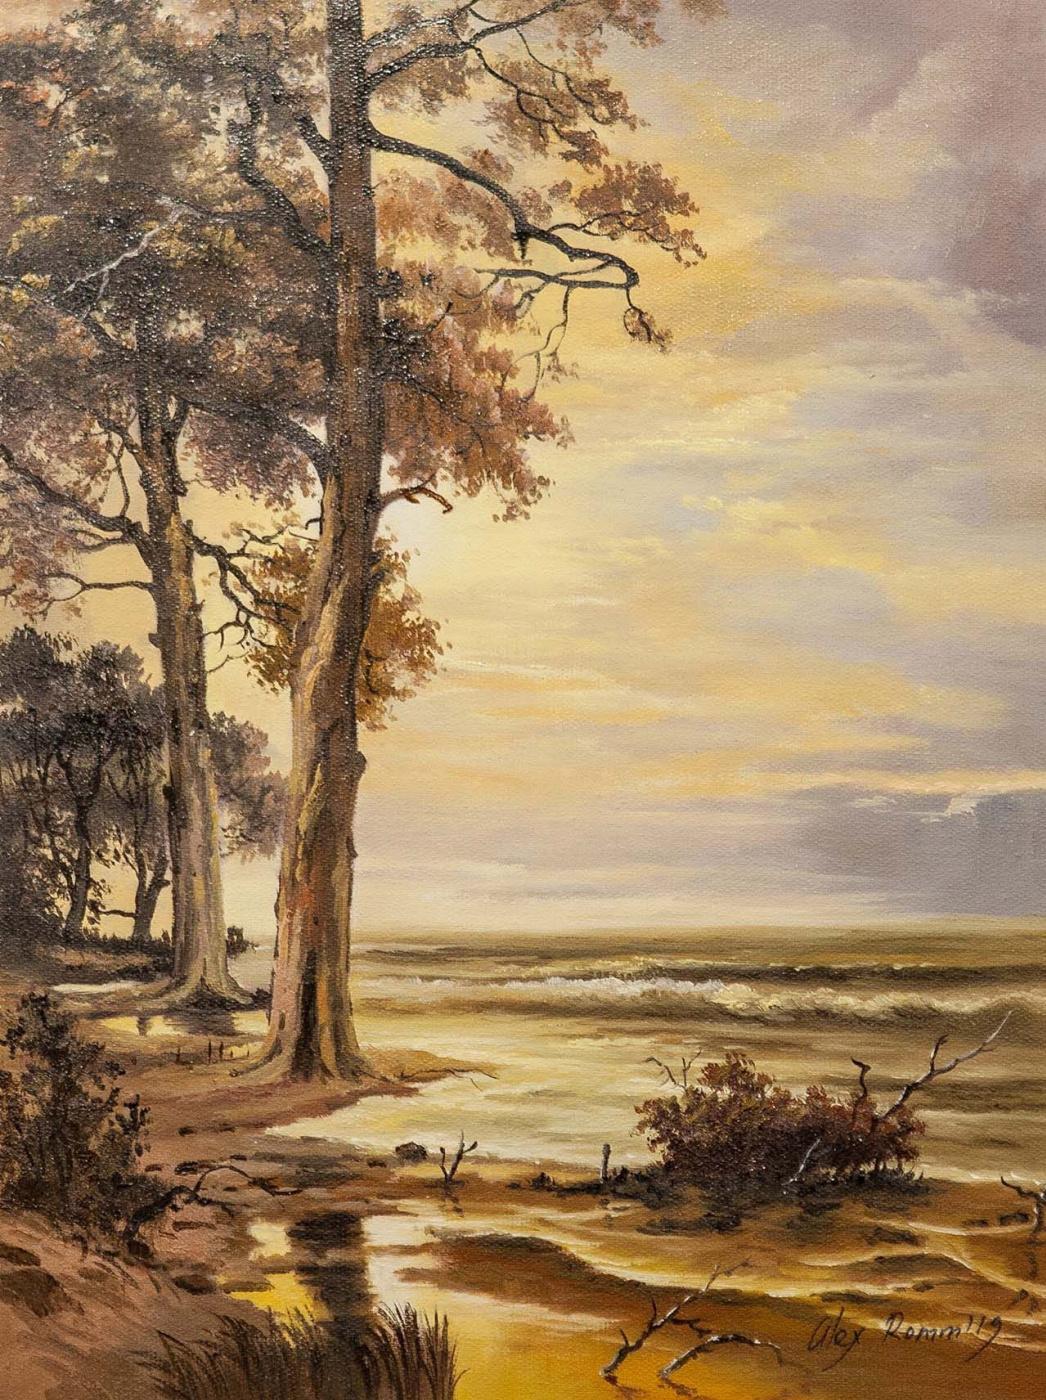 Alexander Romm. Sunset on the shore. In sepia tones